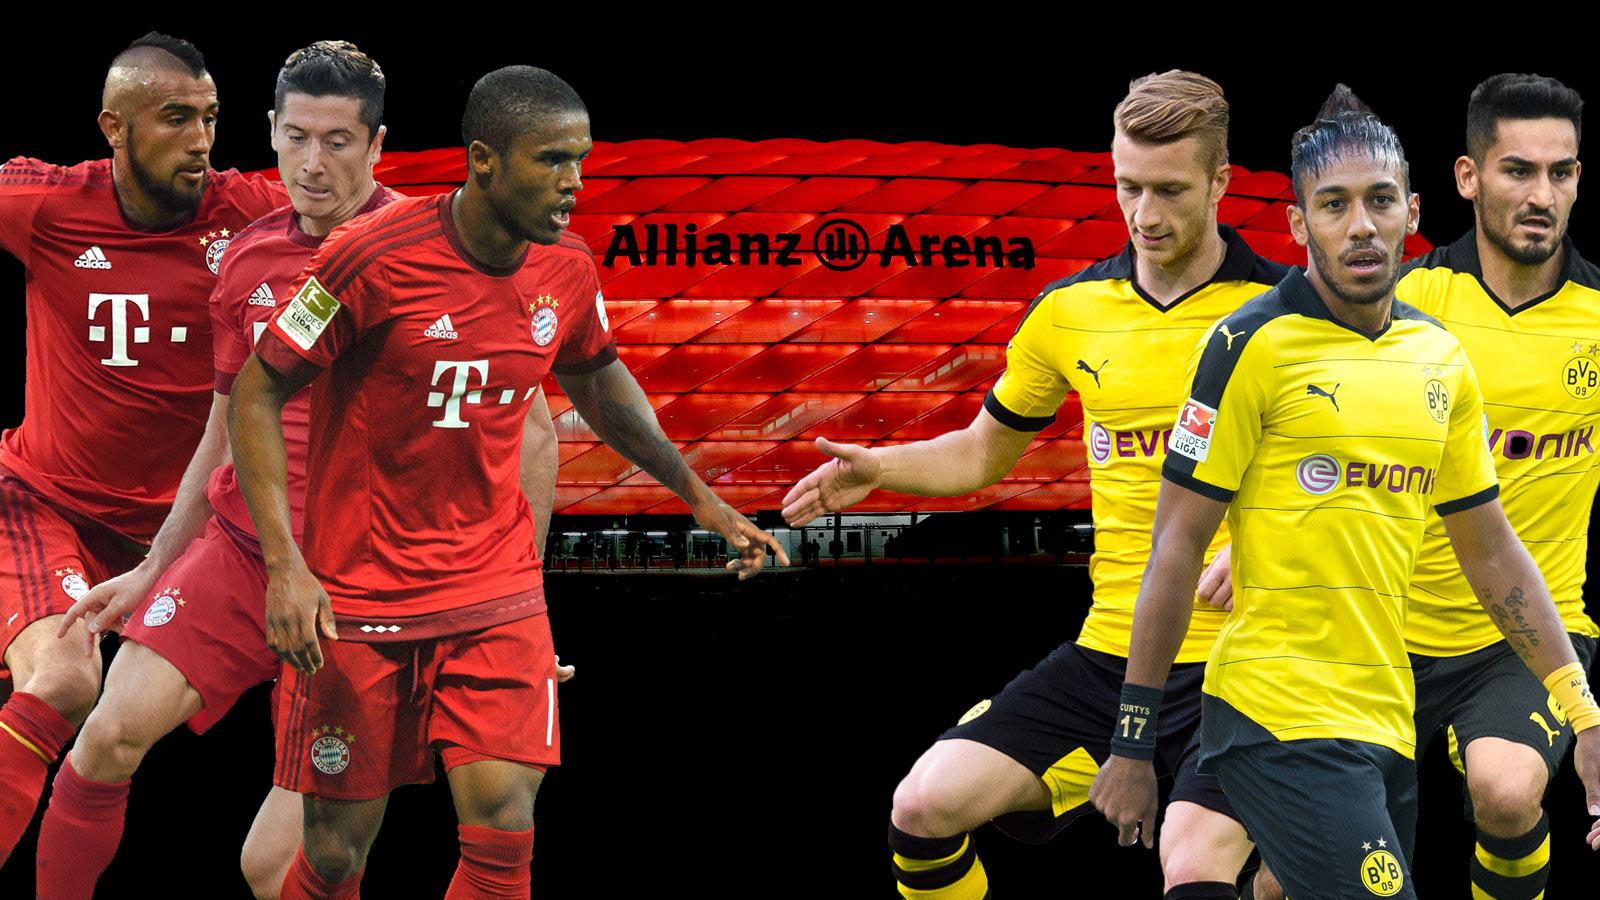 Bayern Munich, Dortmund collide with similar Bundesliga aspirations